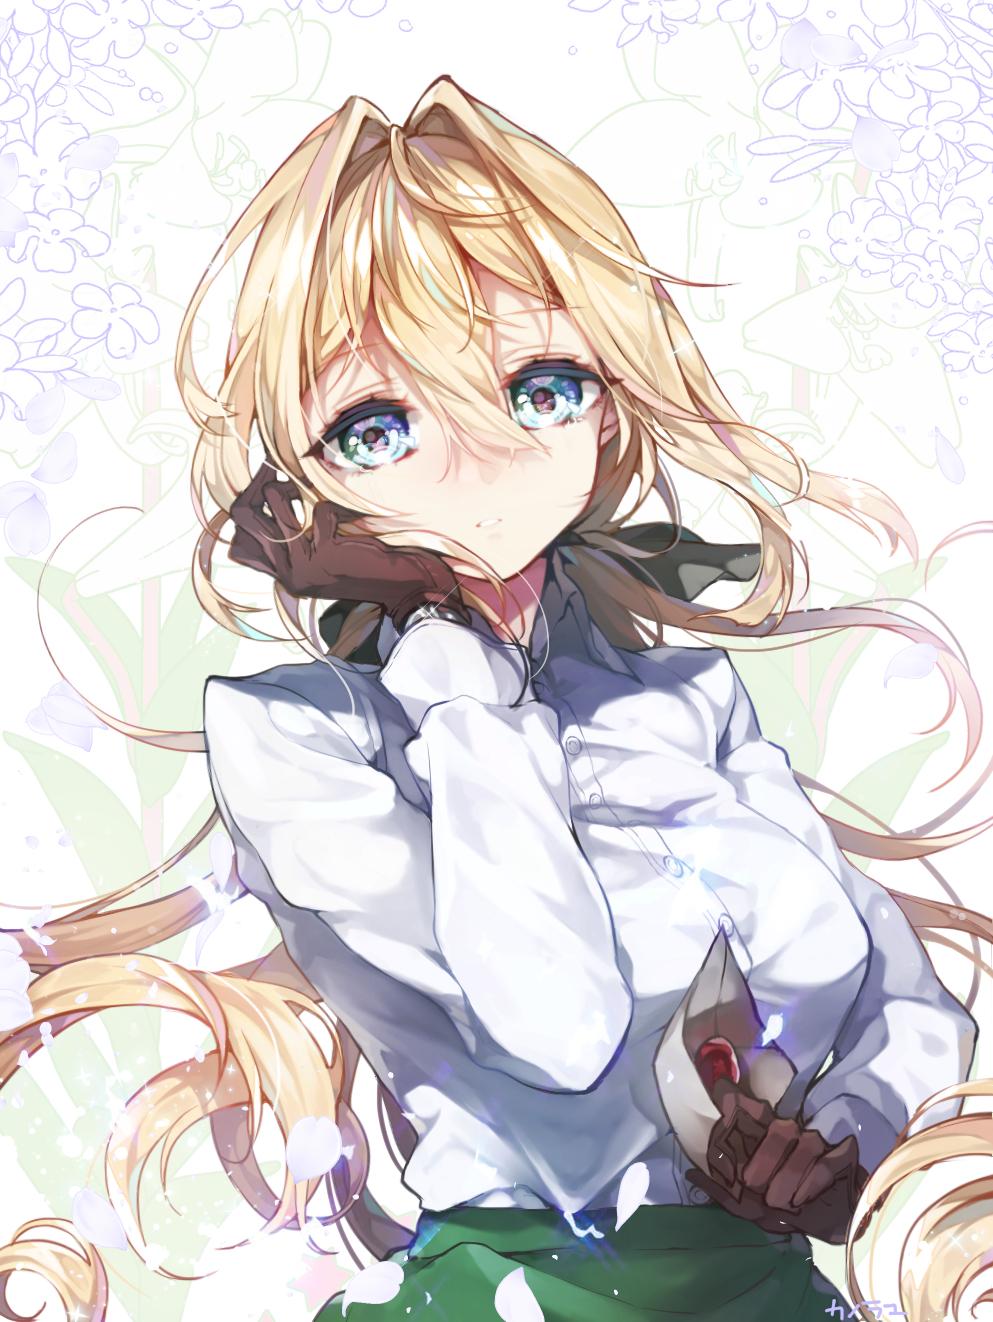 Miku Iphone Wallpaper Pixiv Id 11777115 Zerochan Anime Image Board